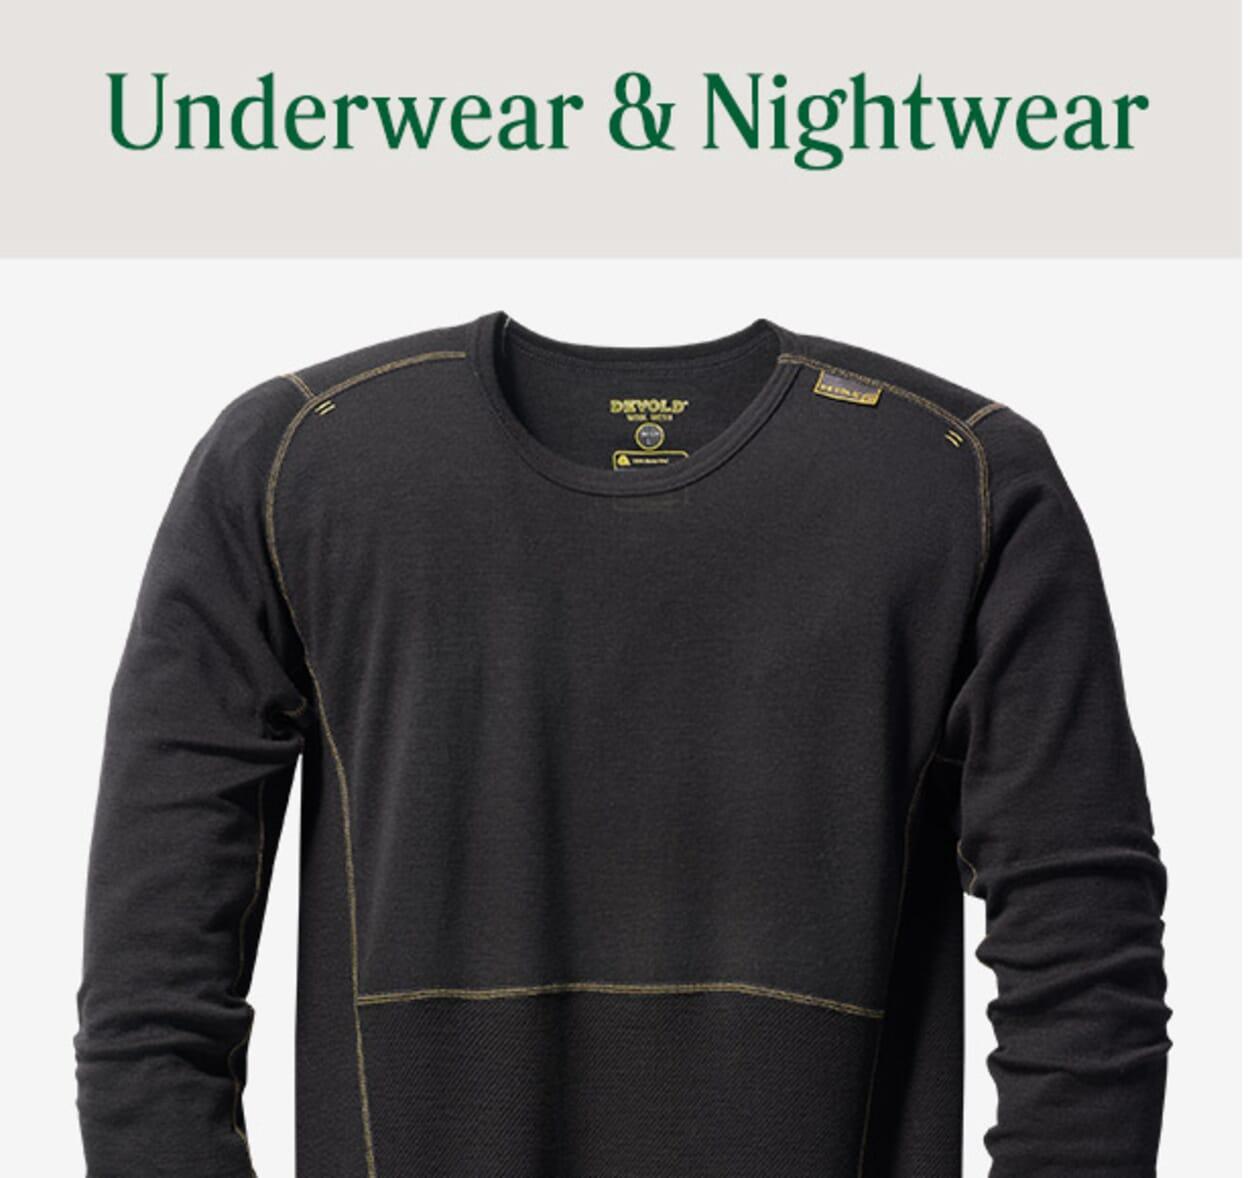 Mens Underwear & Nightwear